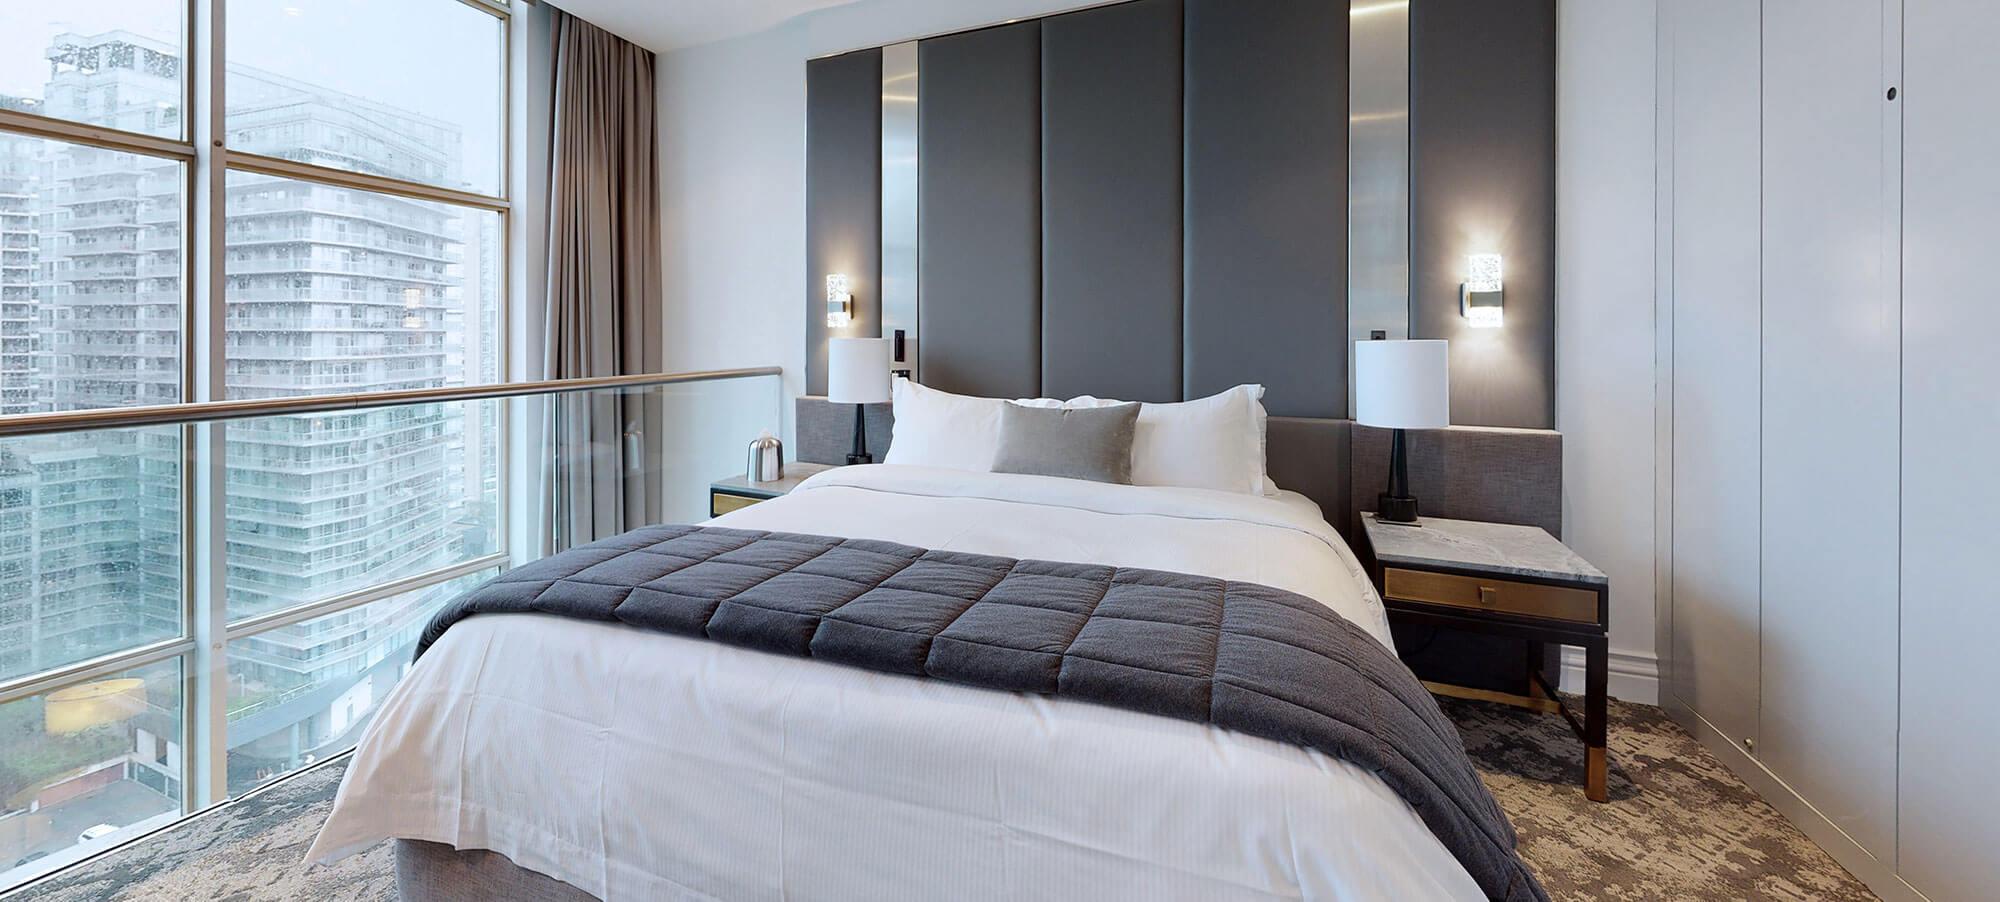 Bedroom at The SoHo Hotel 3-storey Penthouse